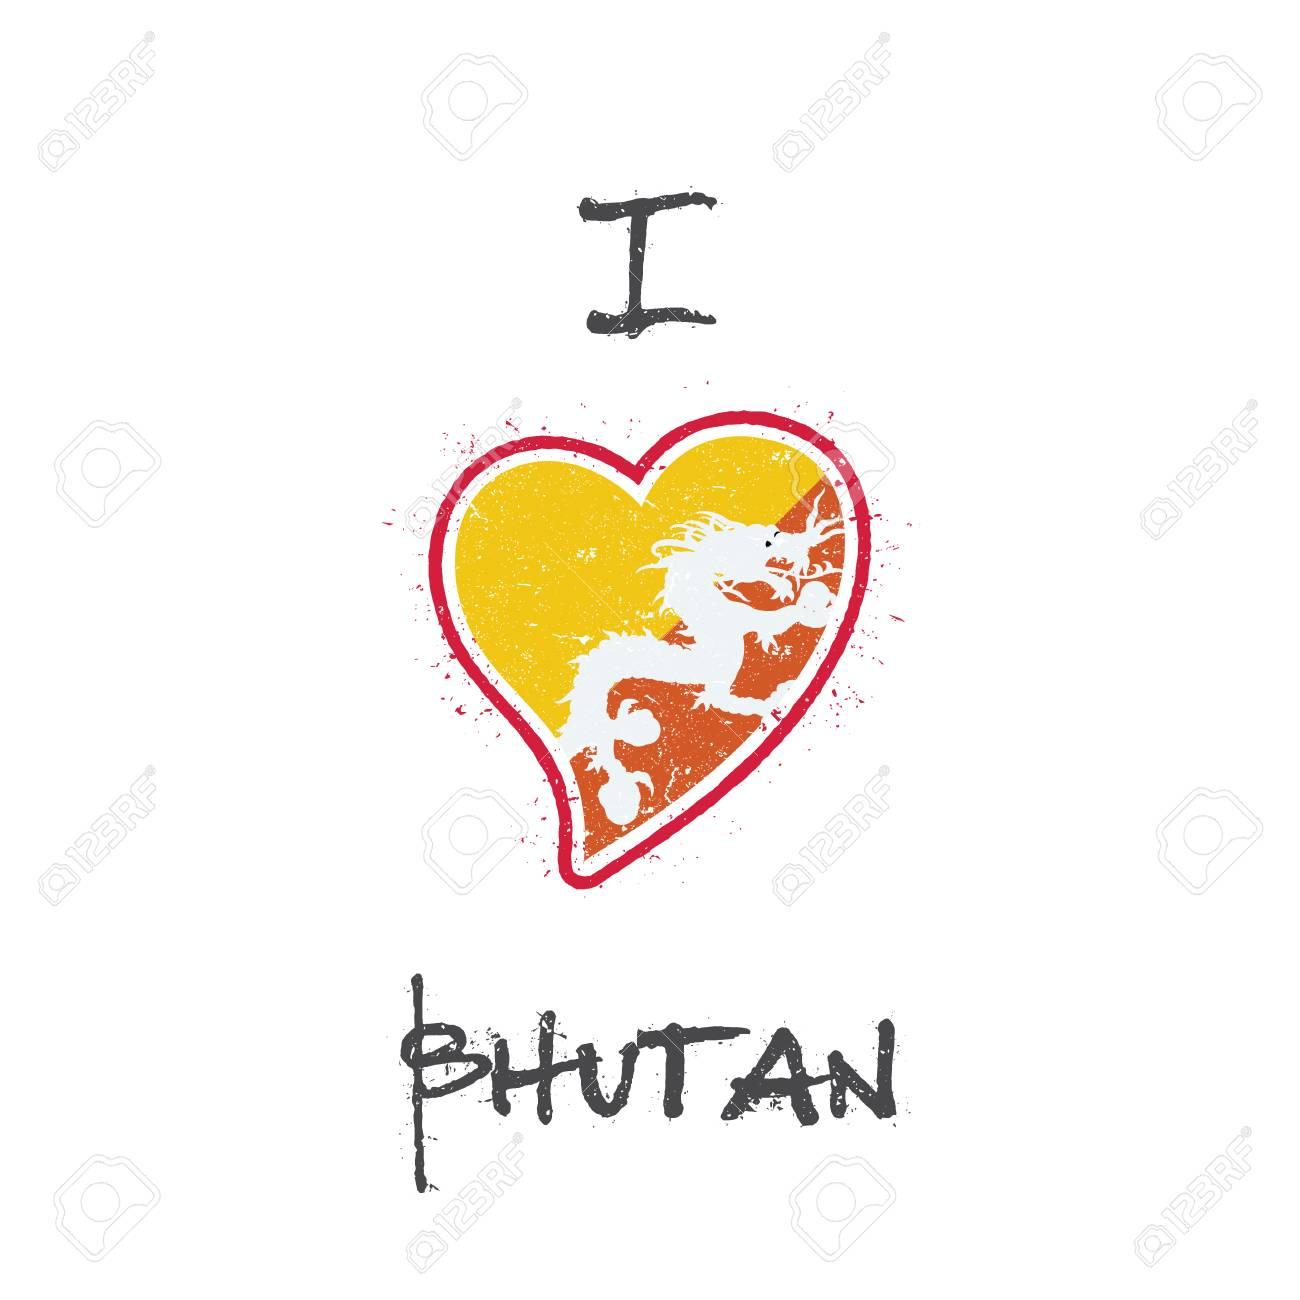 Bhutanese flag patriotic t-shirt design  Heart shaped national